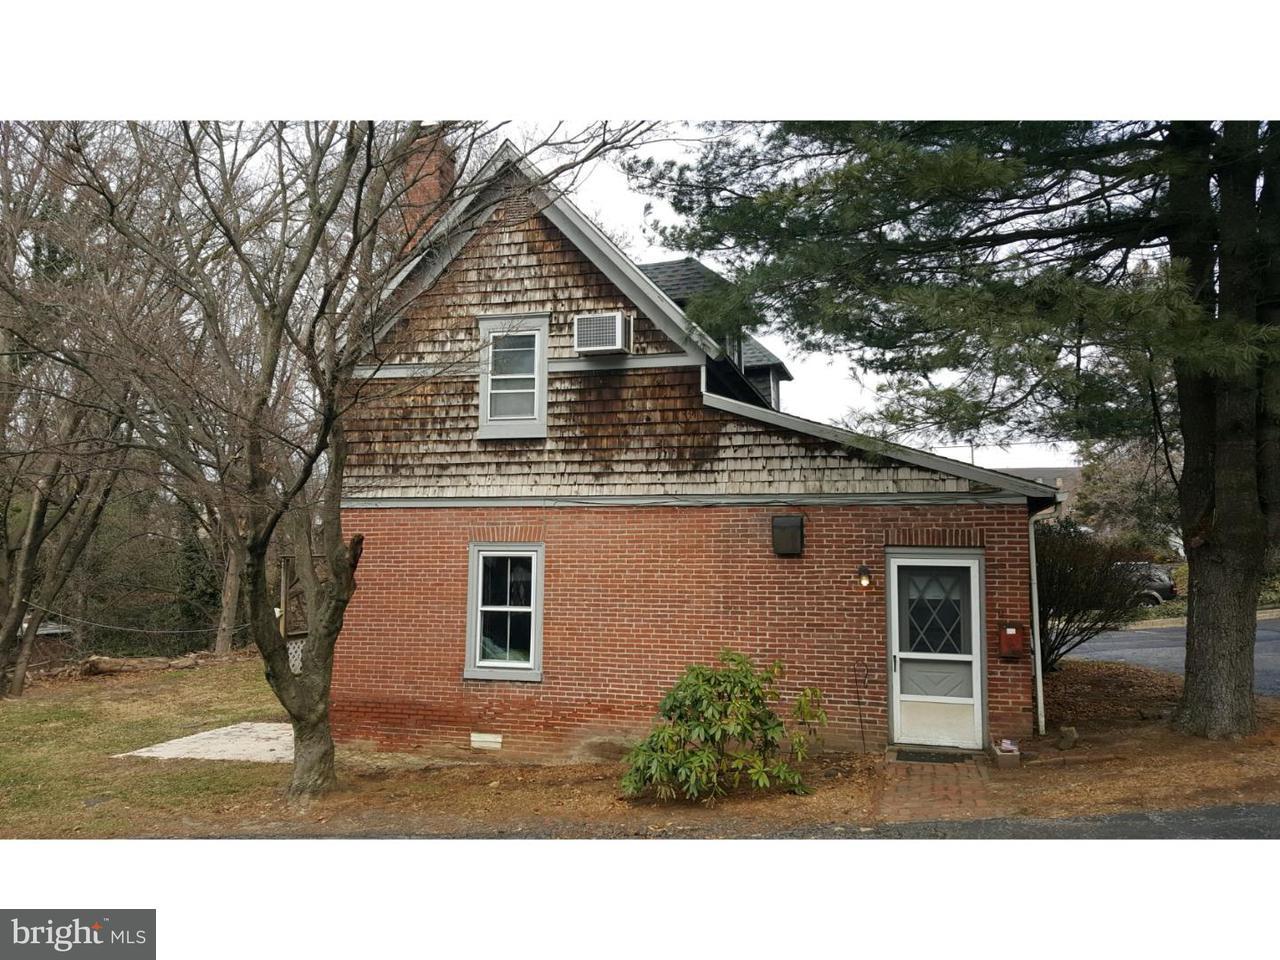 Single Family Home for Rent at 302 W ORANGE Street Media, Pennsylvania 19063 United States